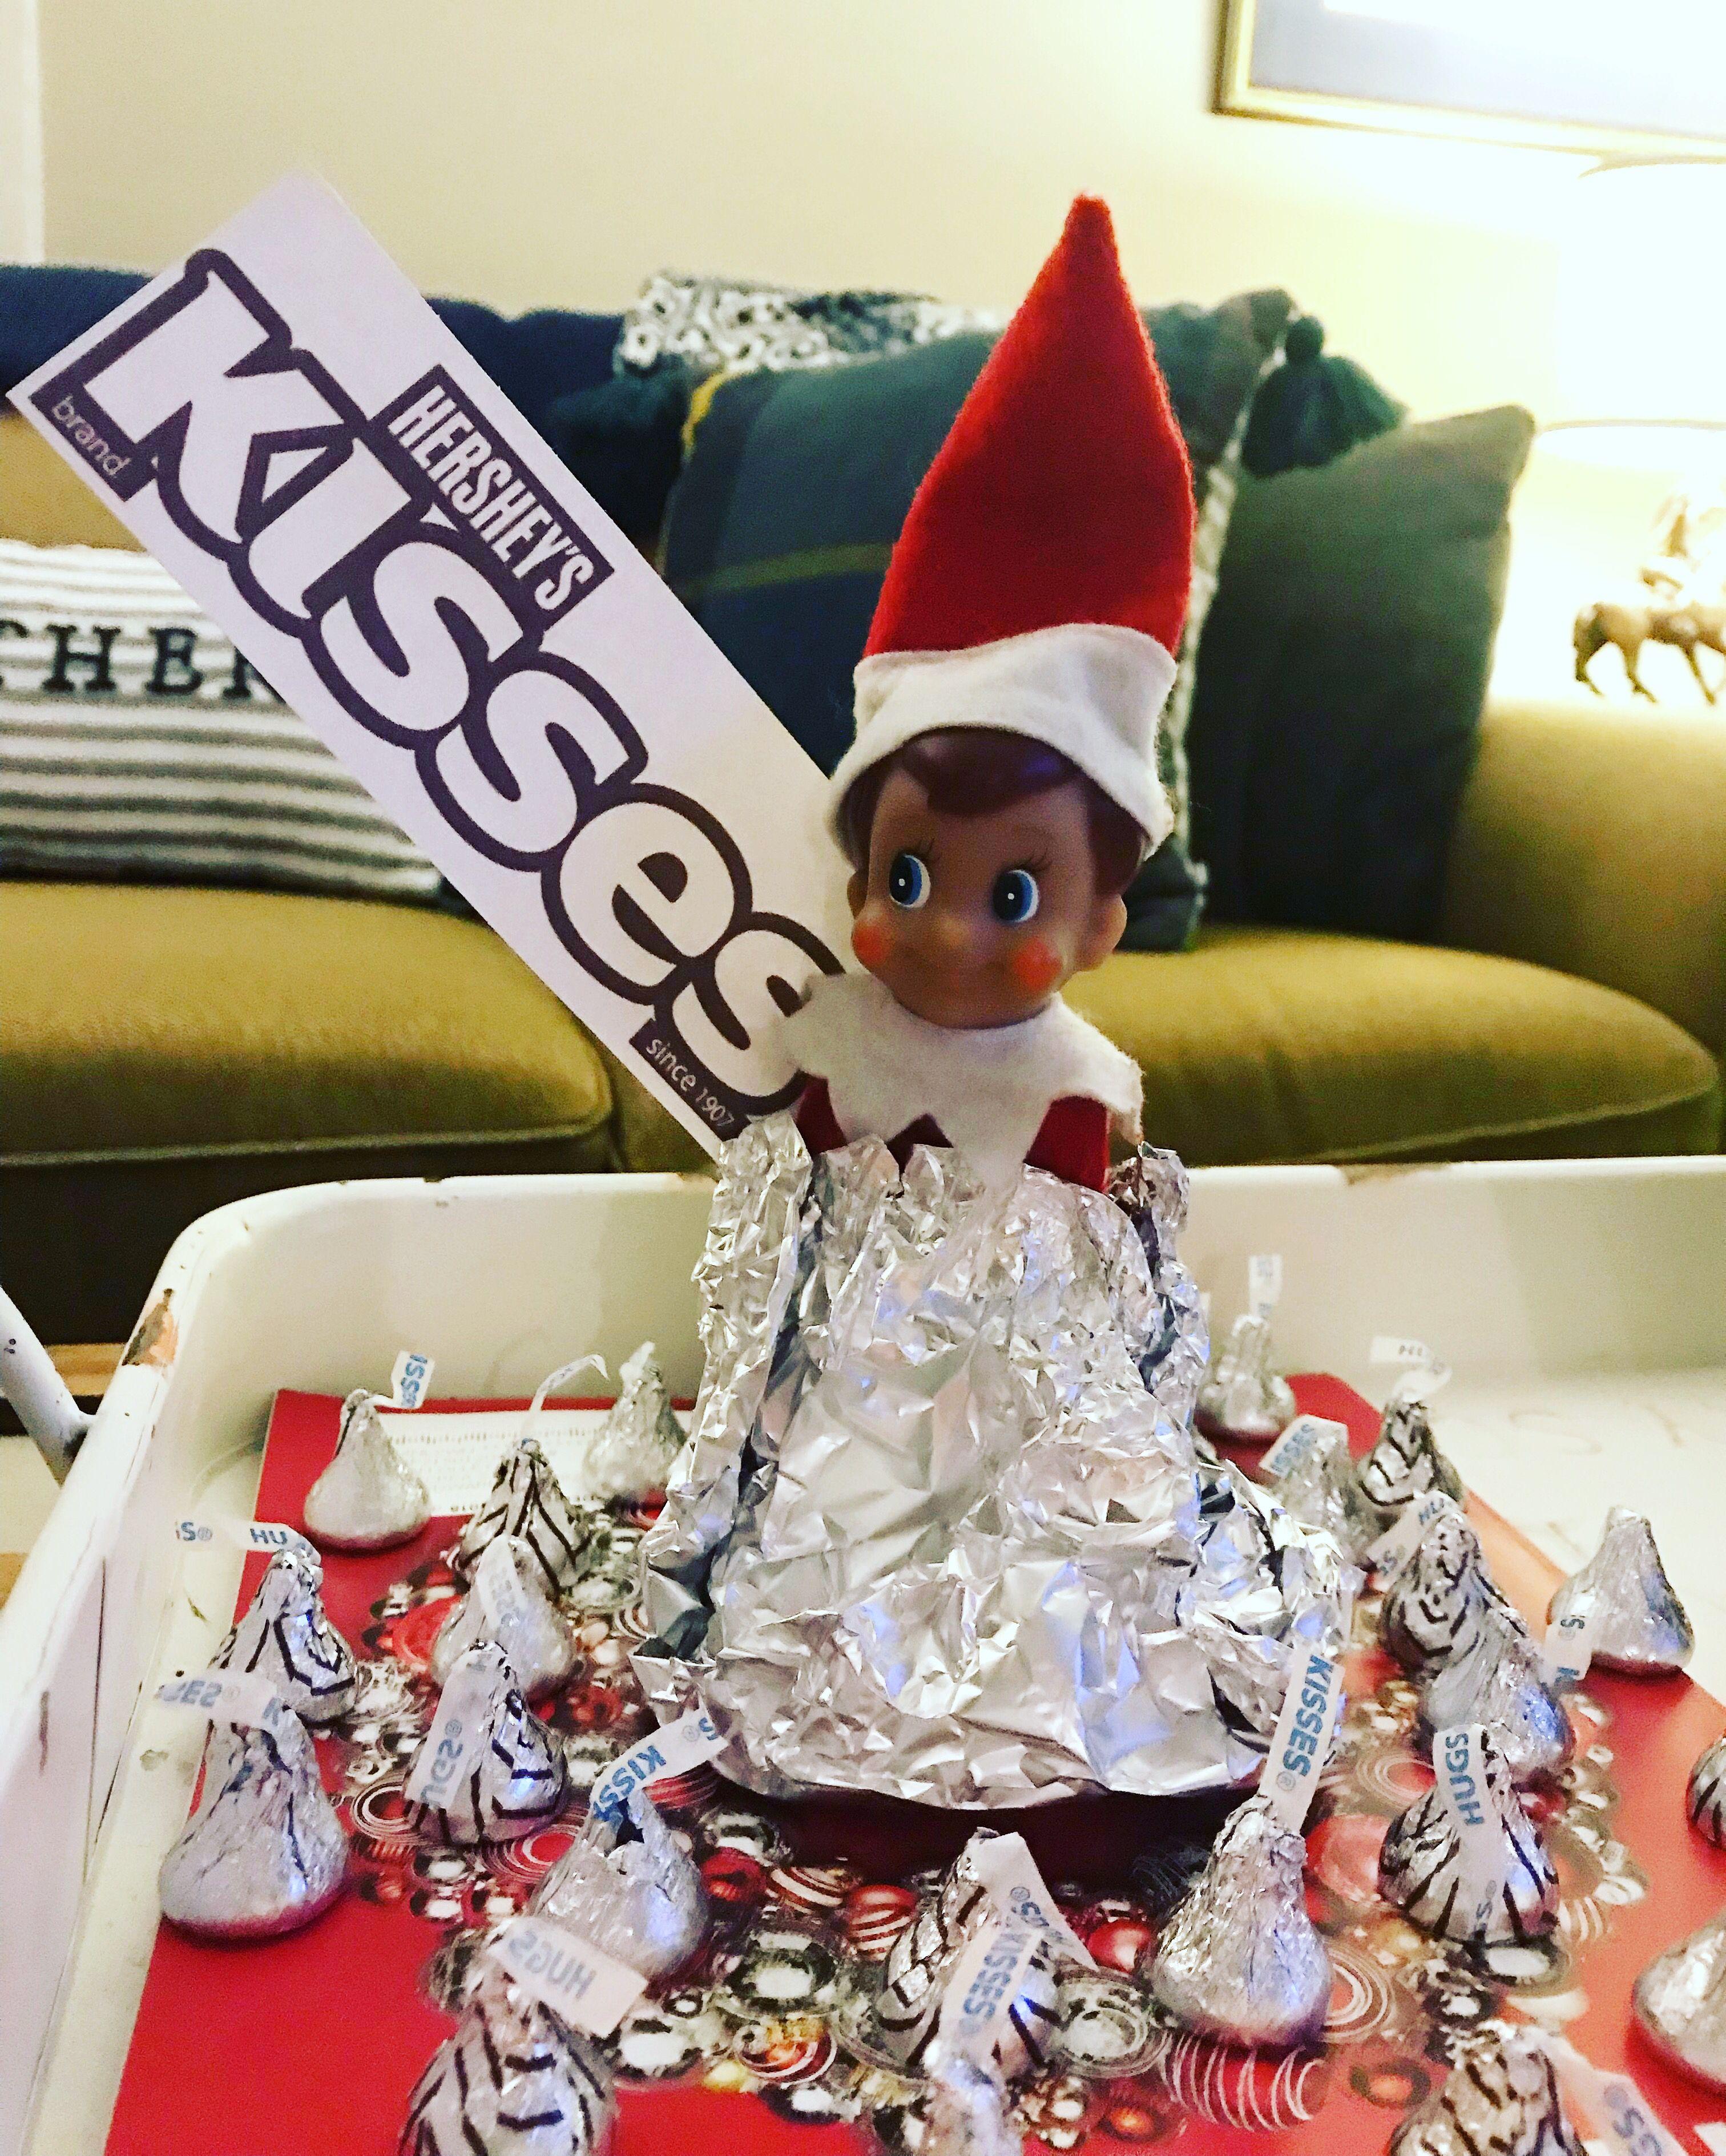 So easy... print Hershey kids logo and wrap in foil! Elf